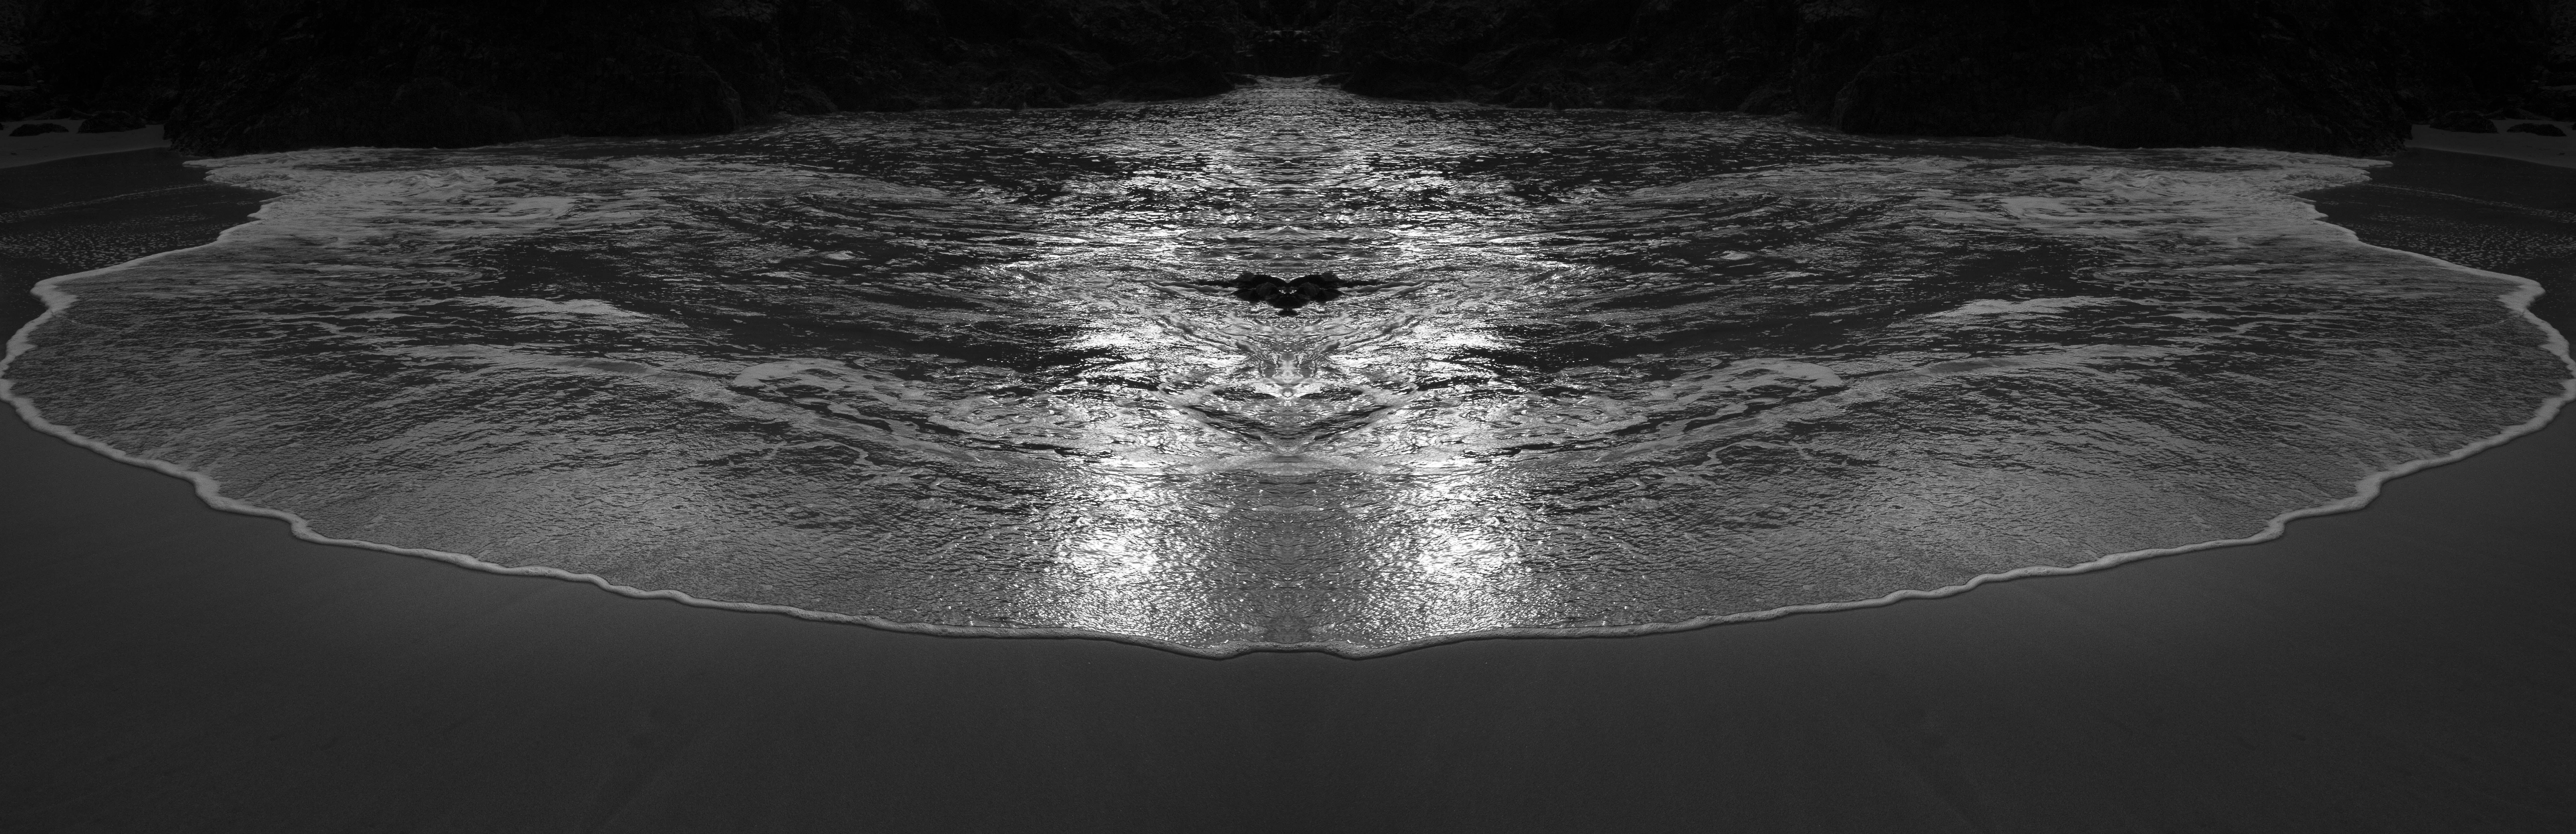 Symmetry 6